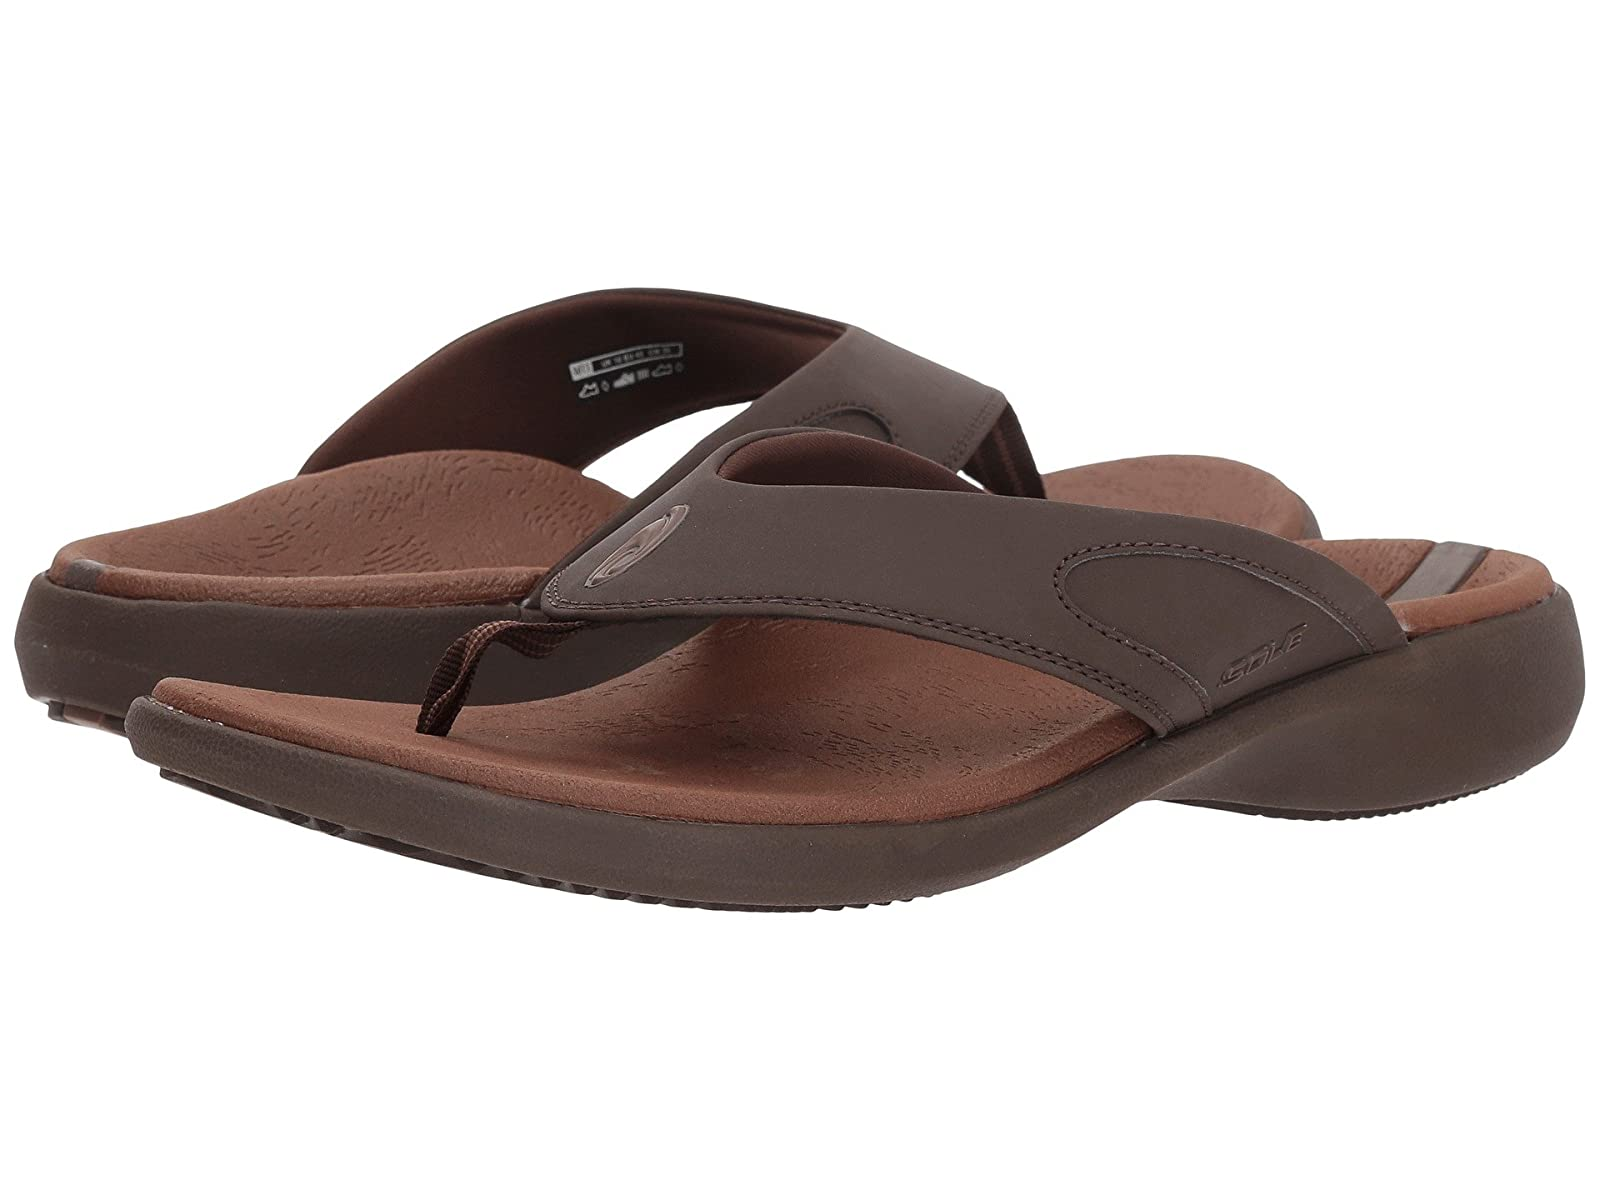 SOLE Sport FlipsAtmospheric grades have affordable shoes